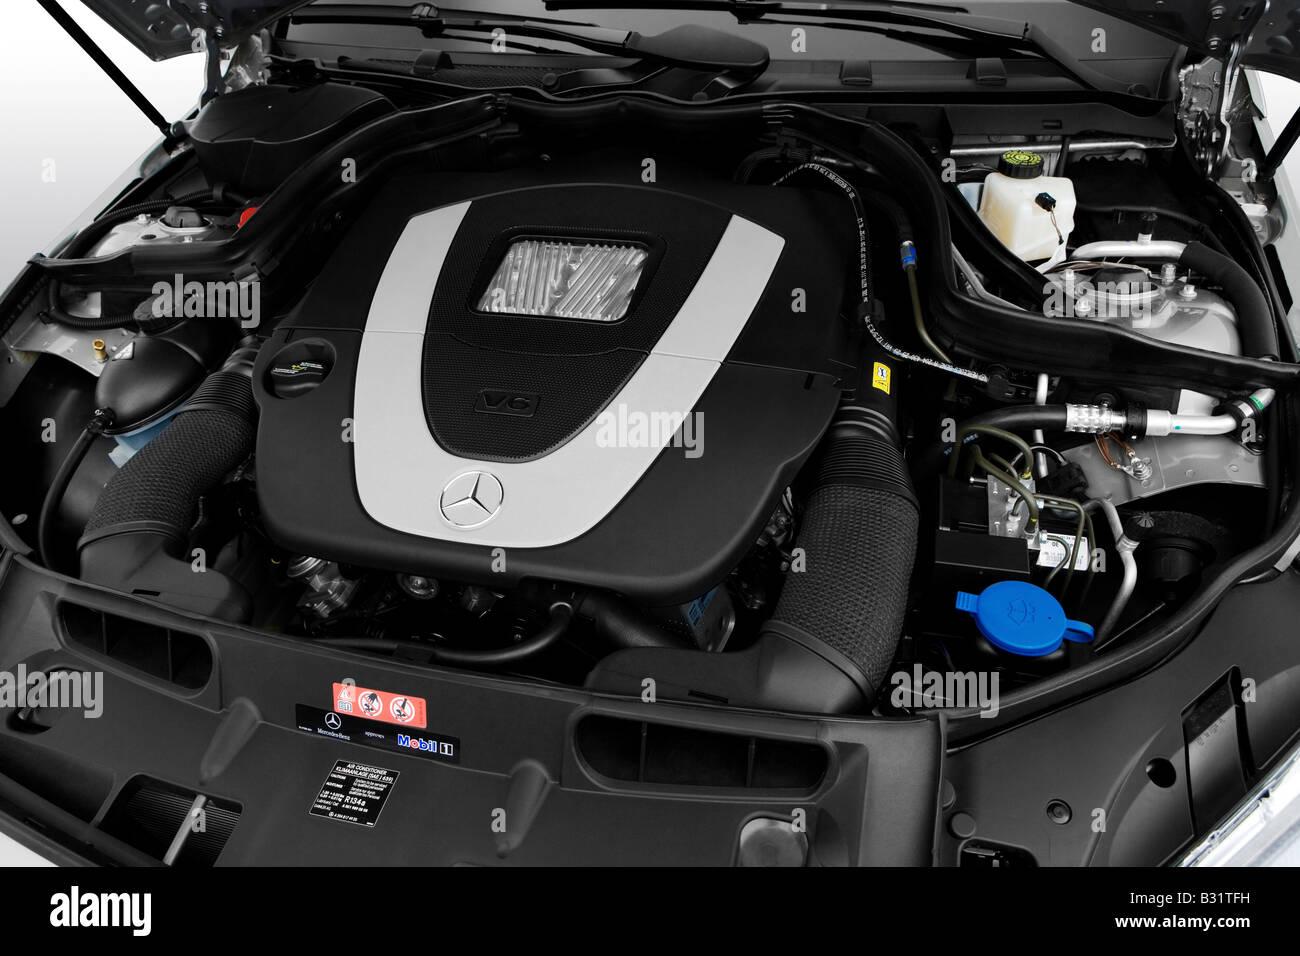 2008 mercedes benz c class c300 in gray engine stock for Mercedes benz c class engine